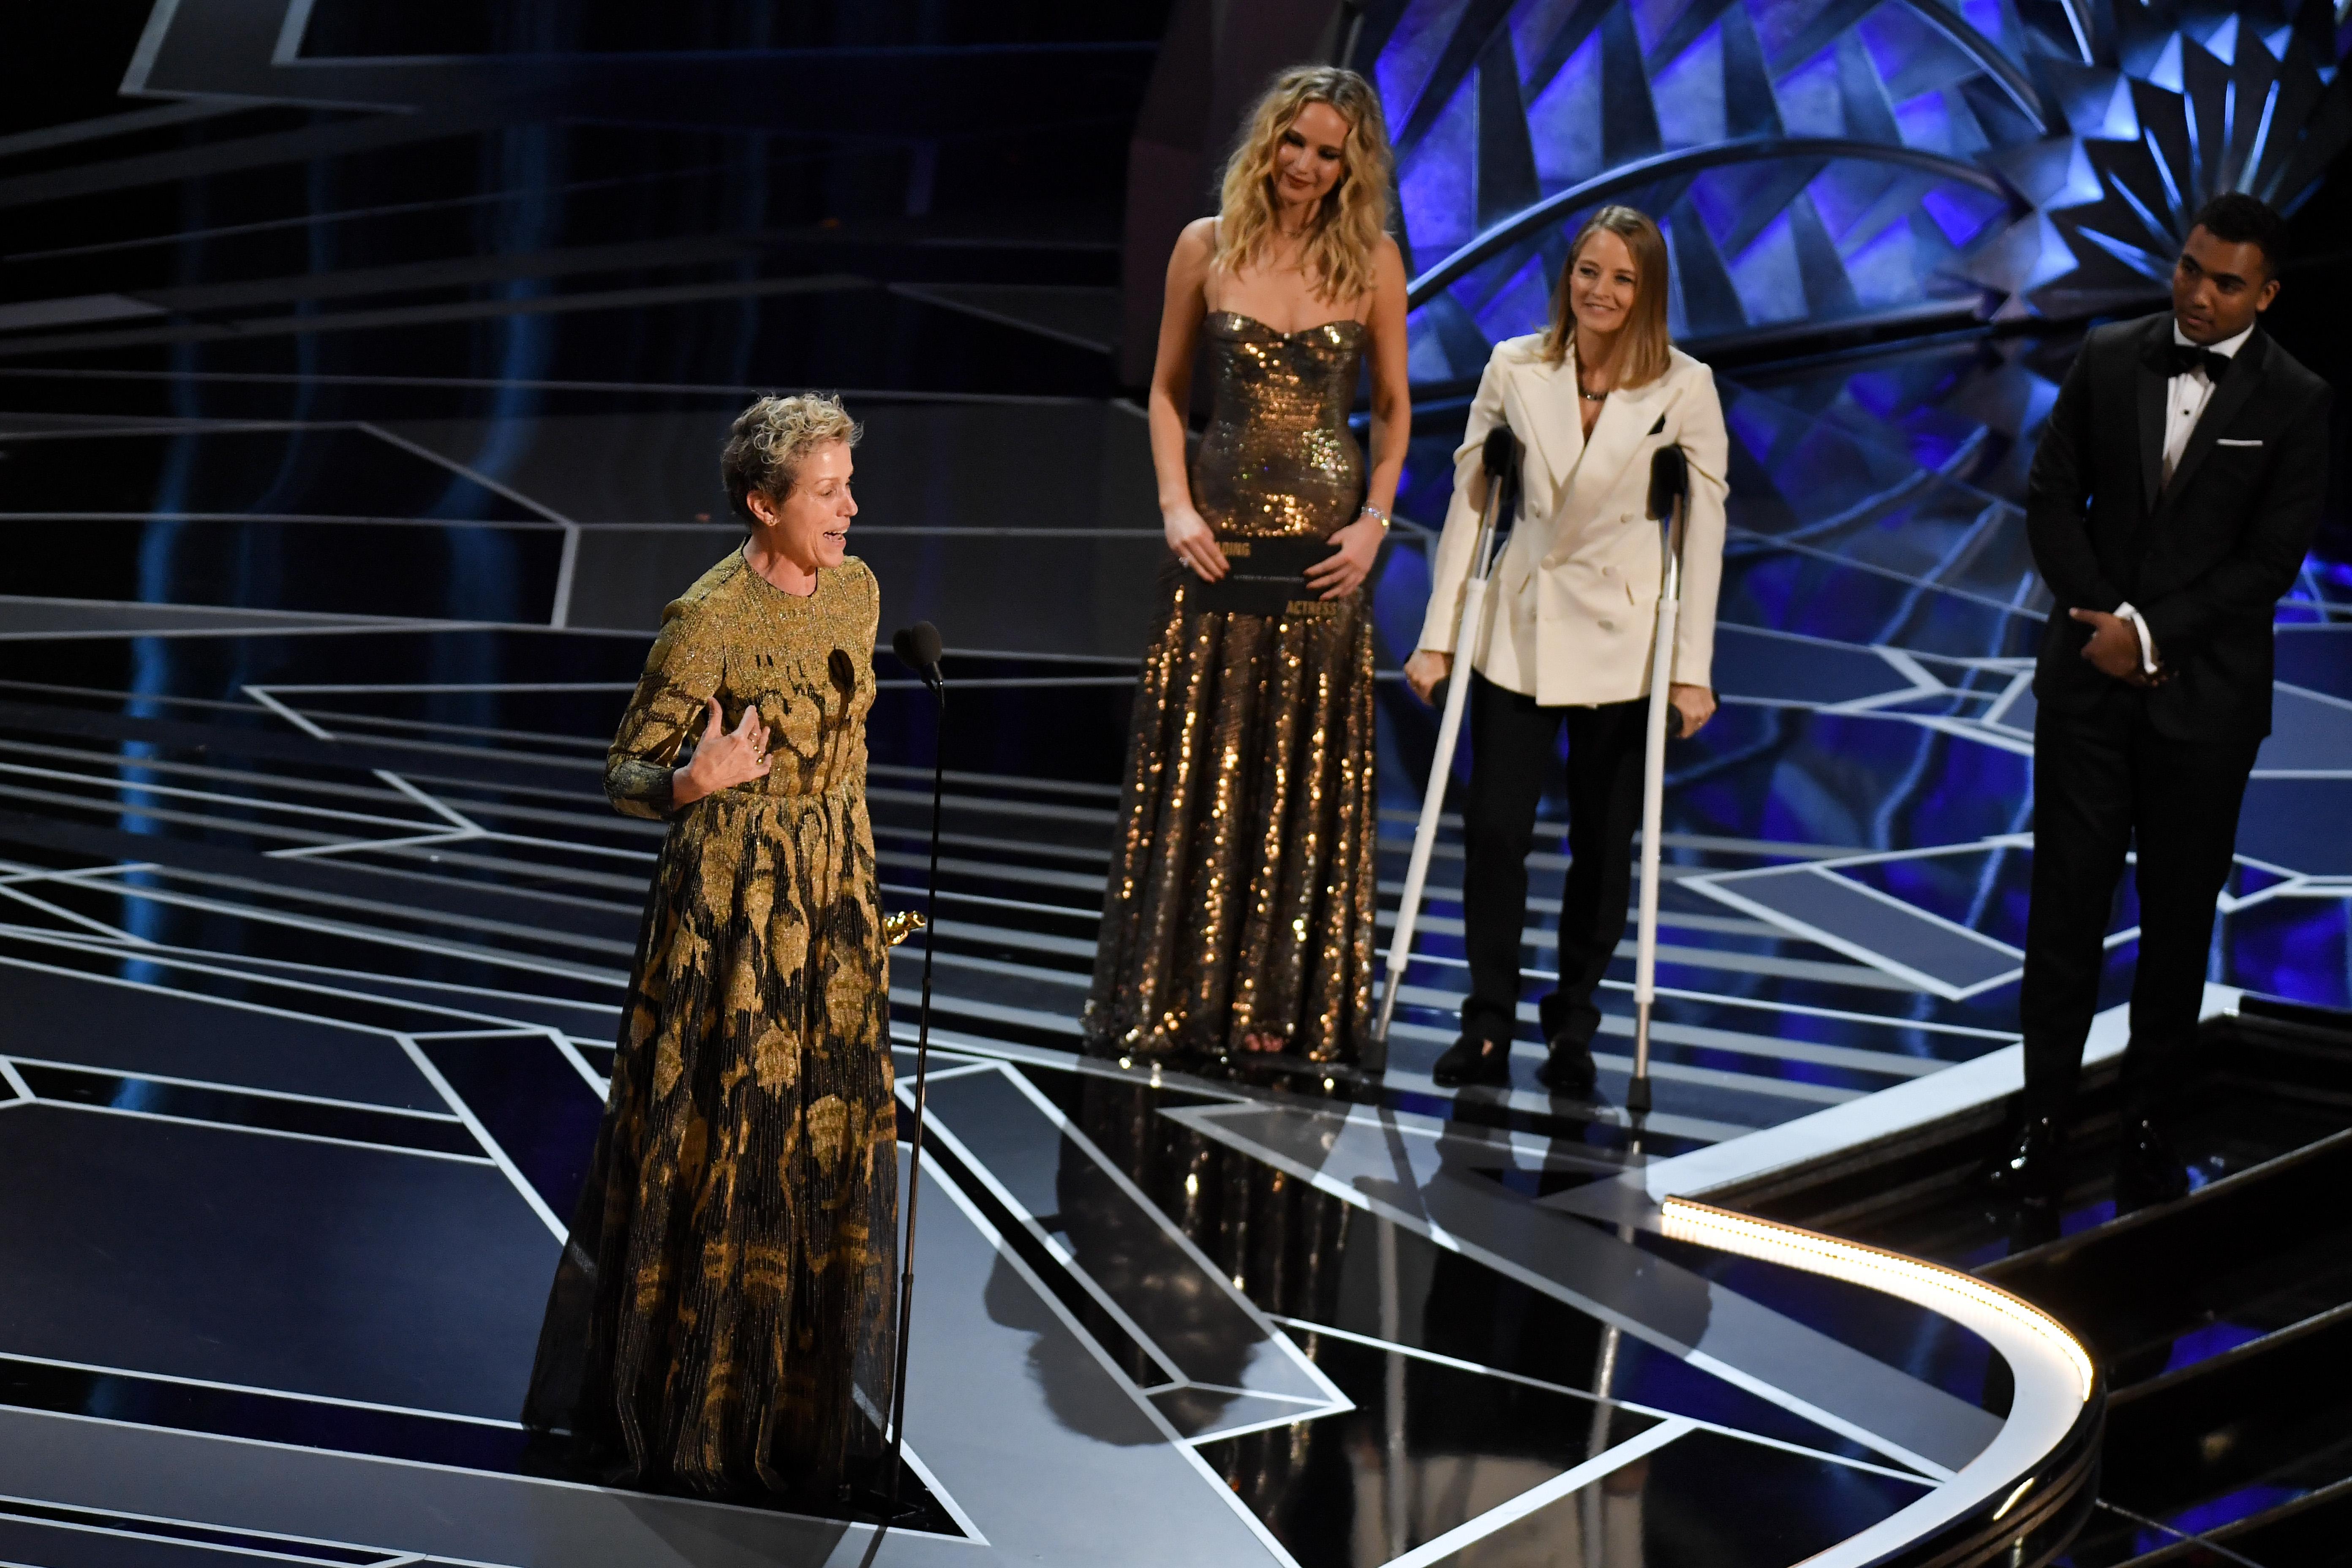 Frances McDormand's Oscar Theft Case Dropped Suddenly By Los Angeles D.A